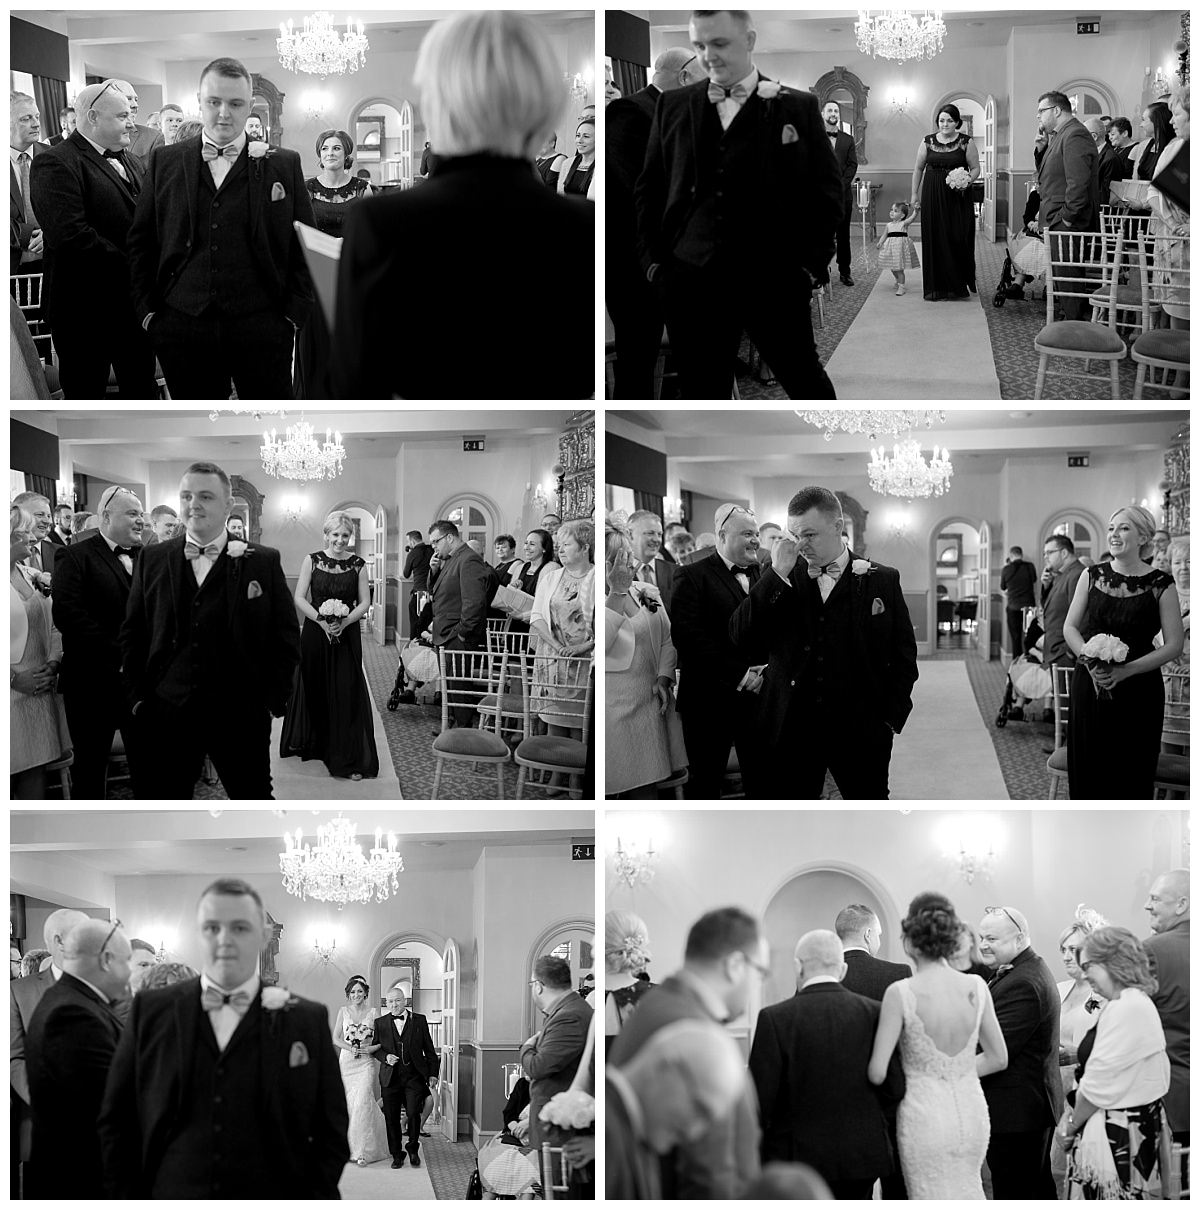 Wedding Ceremony at Weston Hall